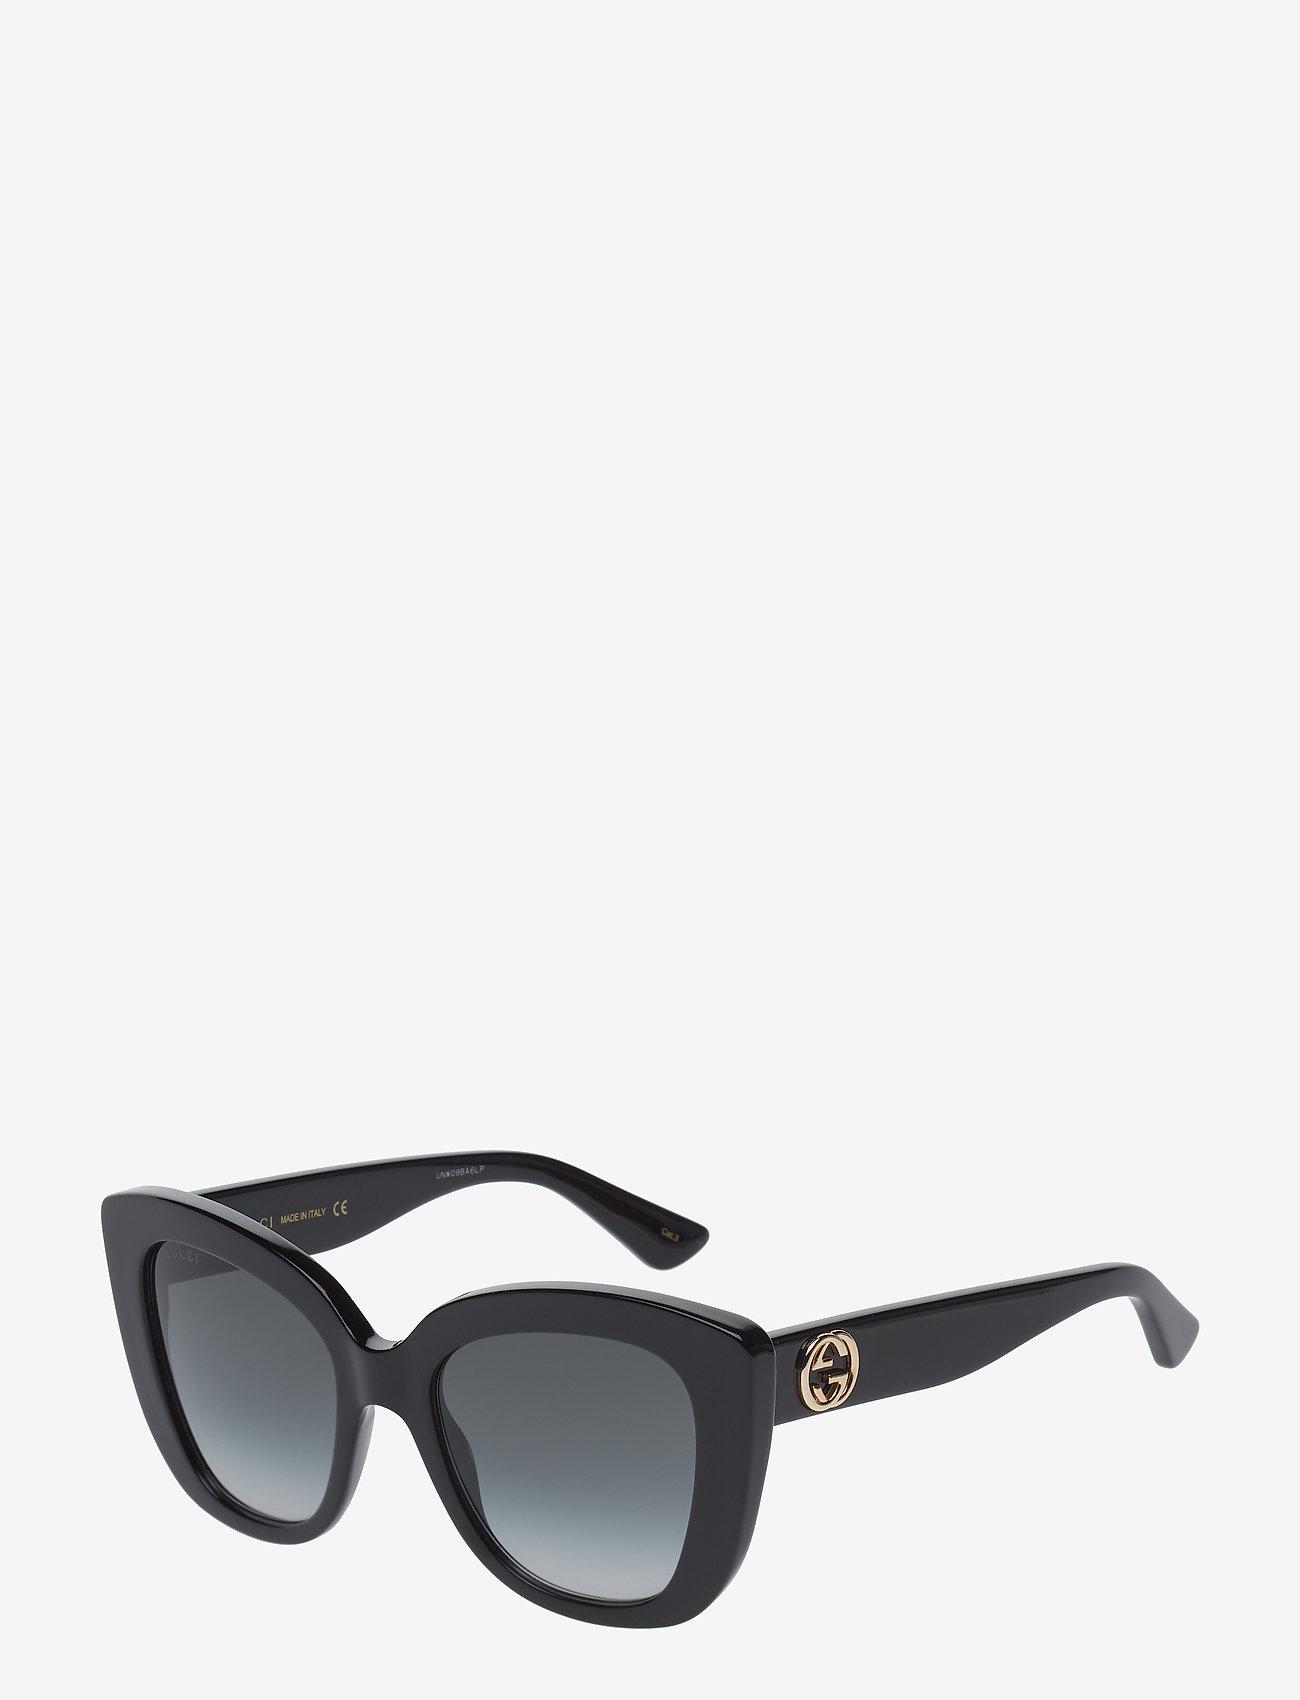 Gucci Sunglasses - GG0327S - cat-eye - black-black-grey - 1